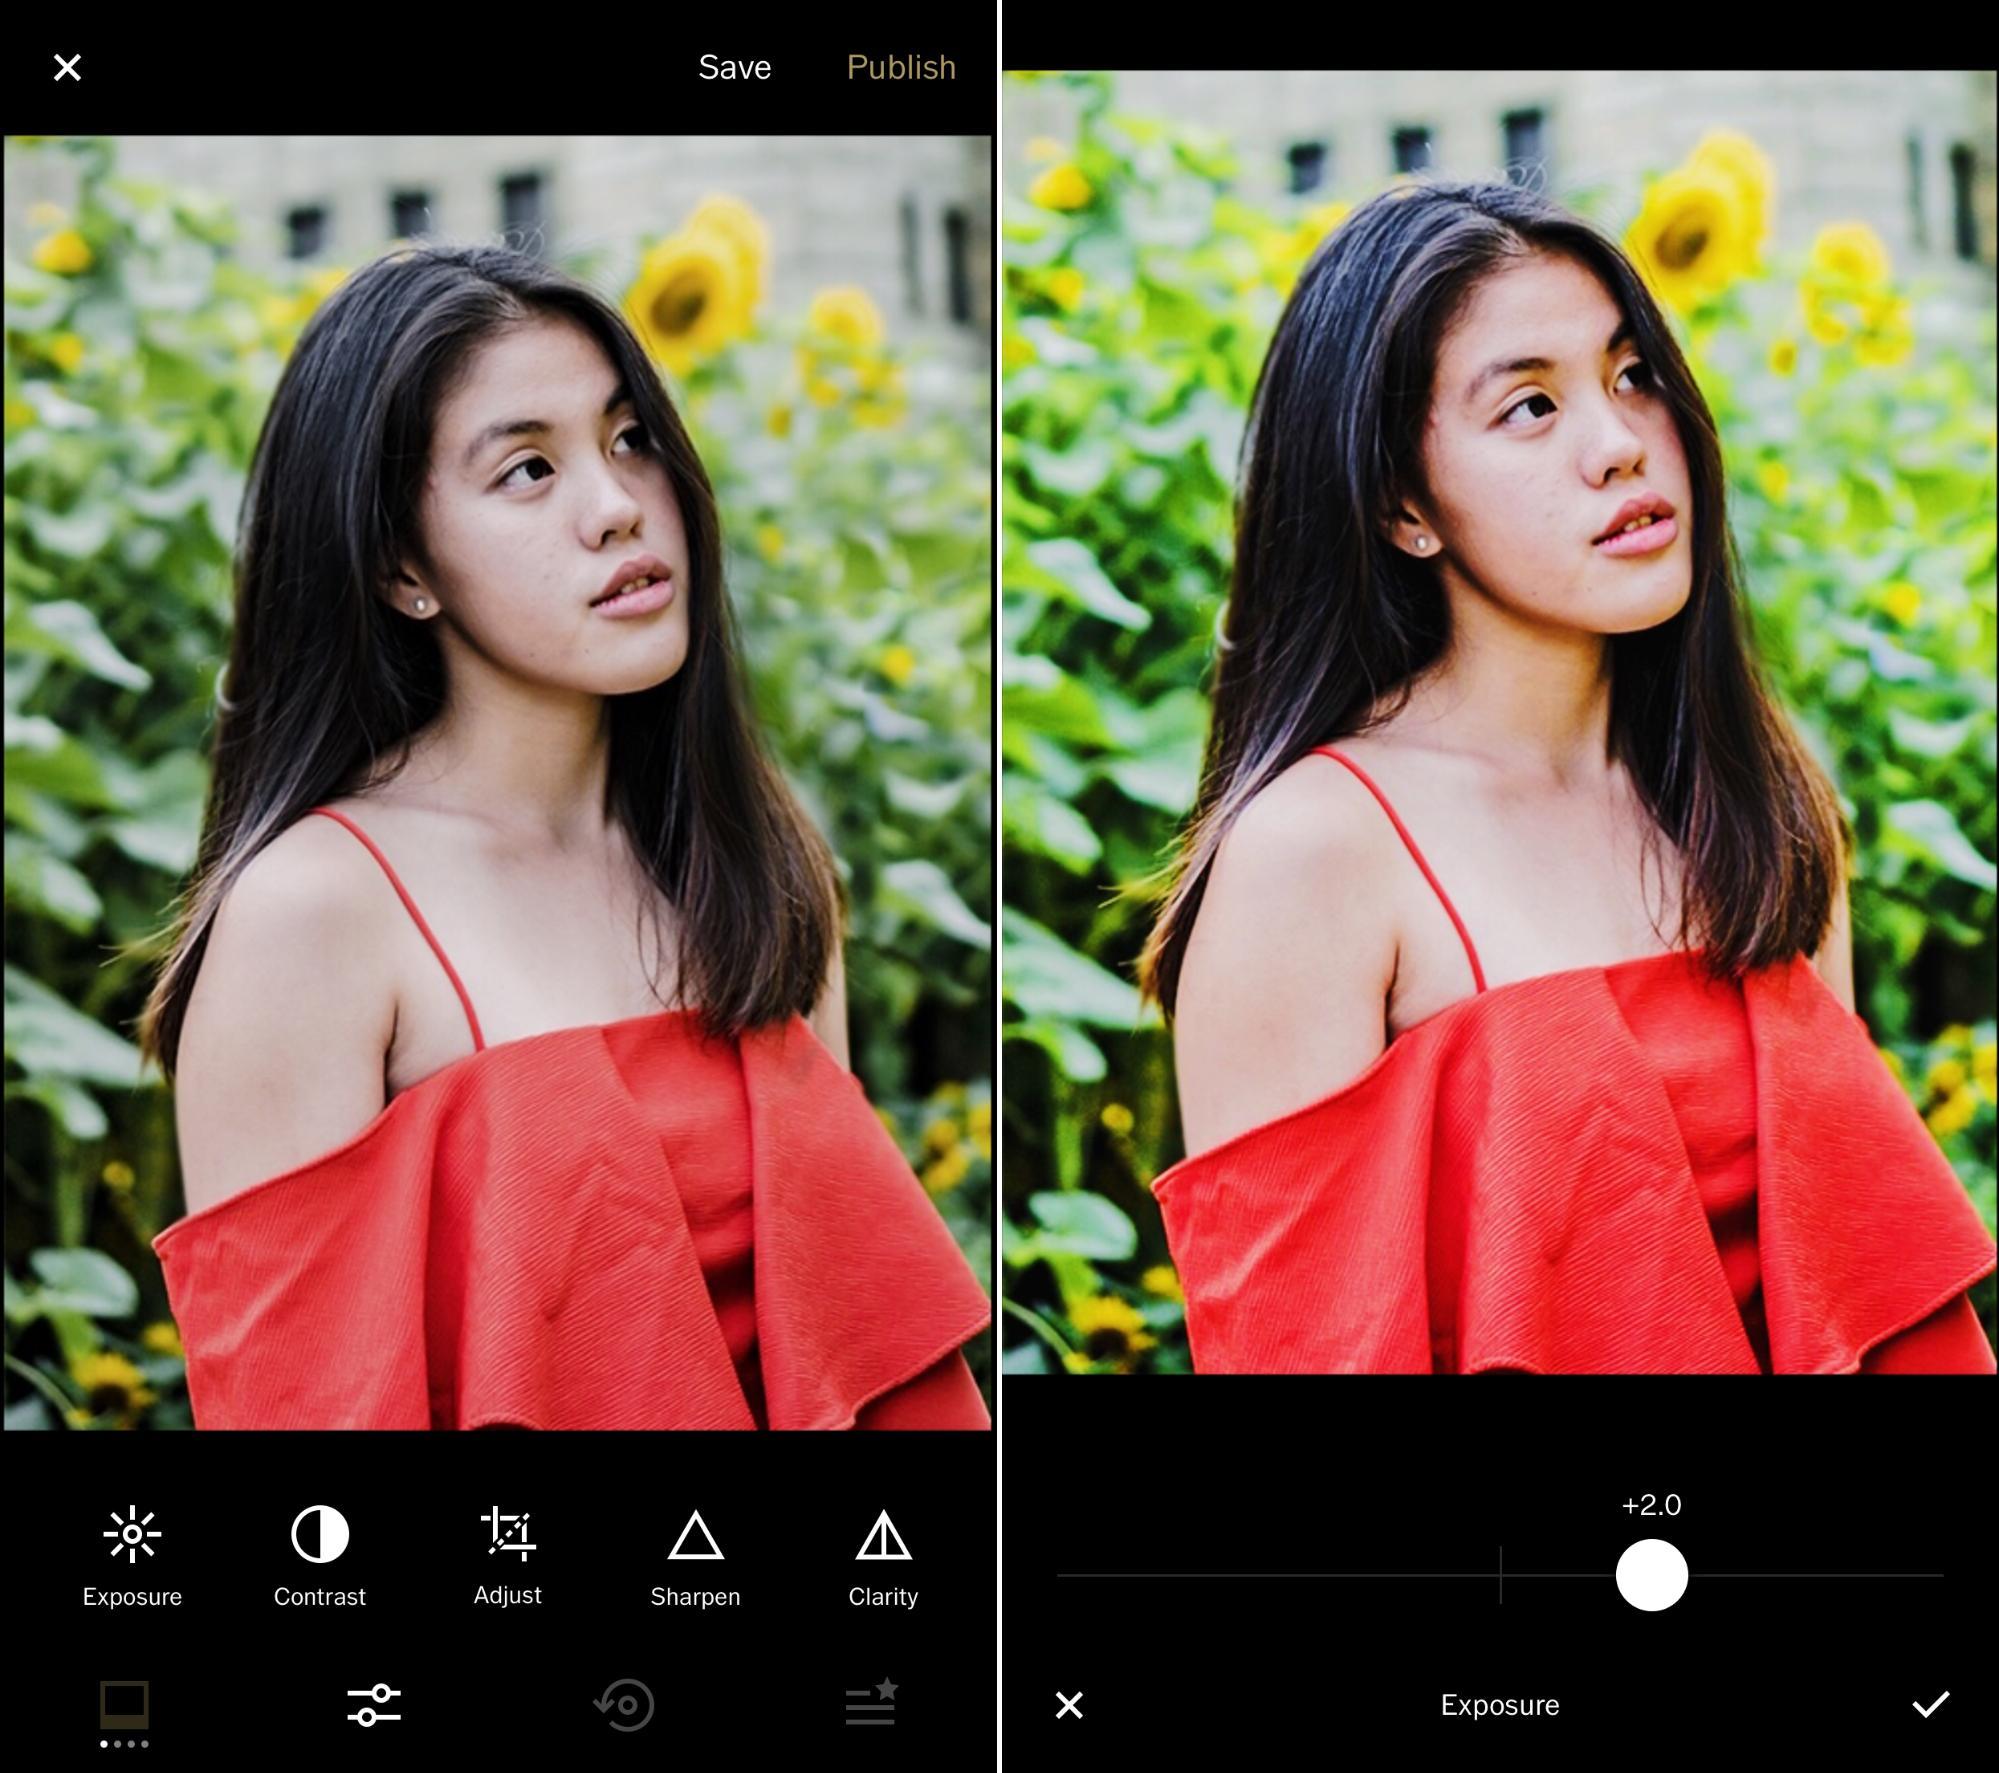 Sunflower surprise ootd using phone GBTB - VSCO contrast brightness